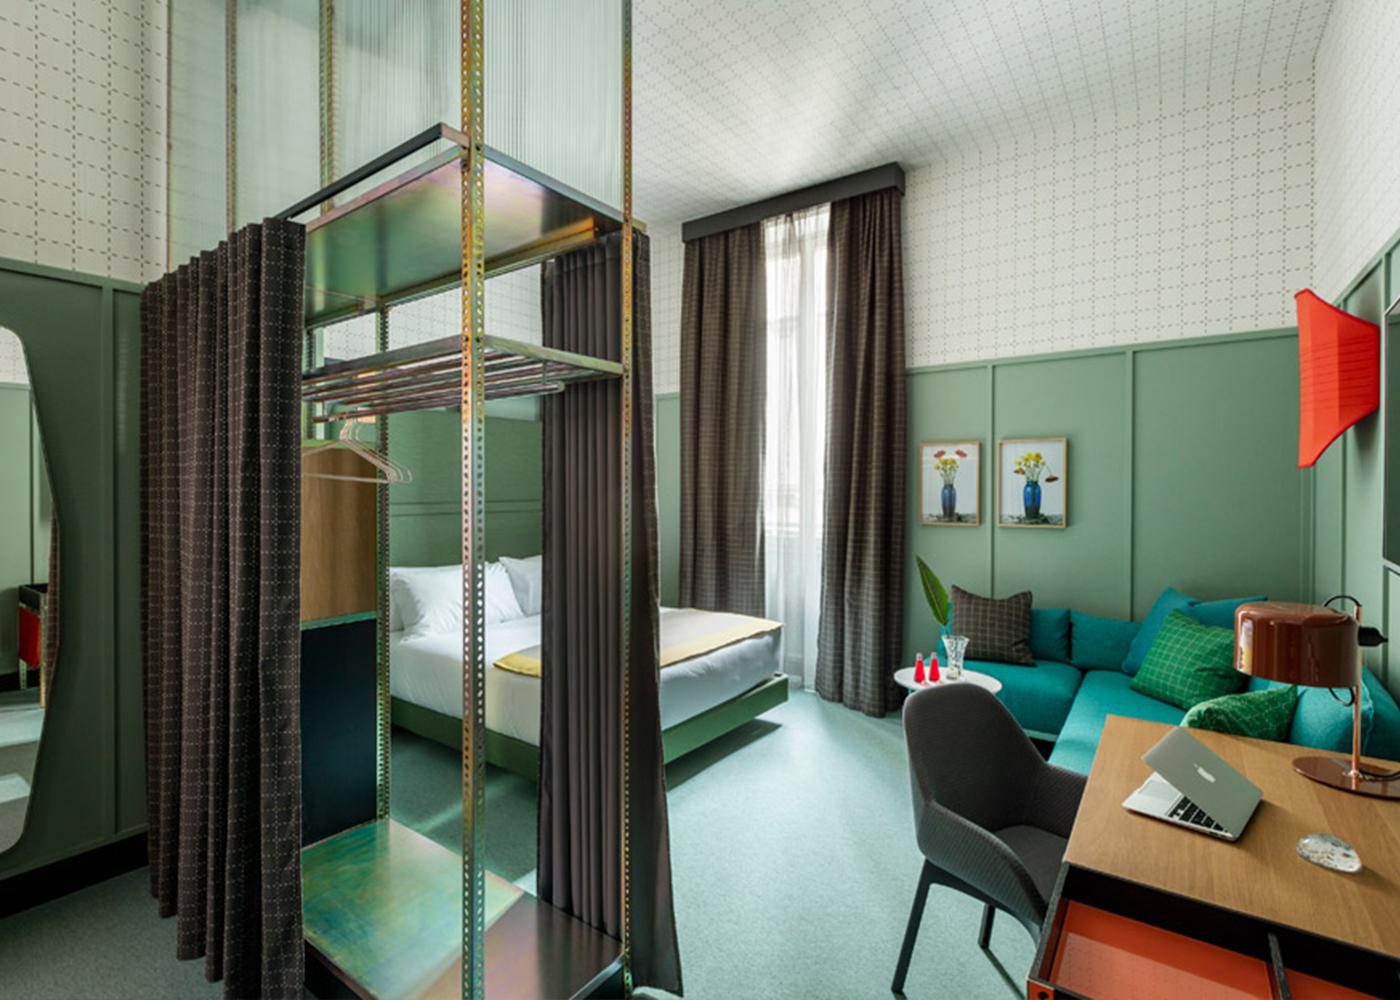 patricia-urquiola-room-mate-hotels-interior-design-milan_dezeen_936_8